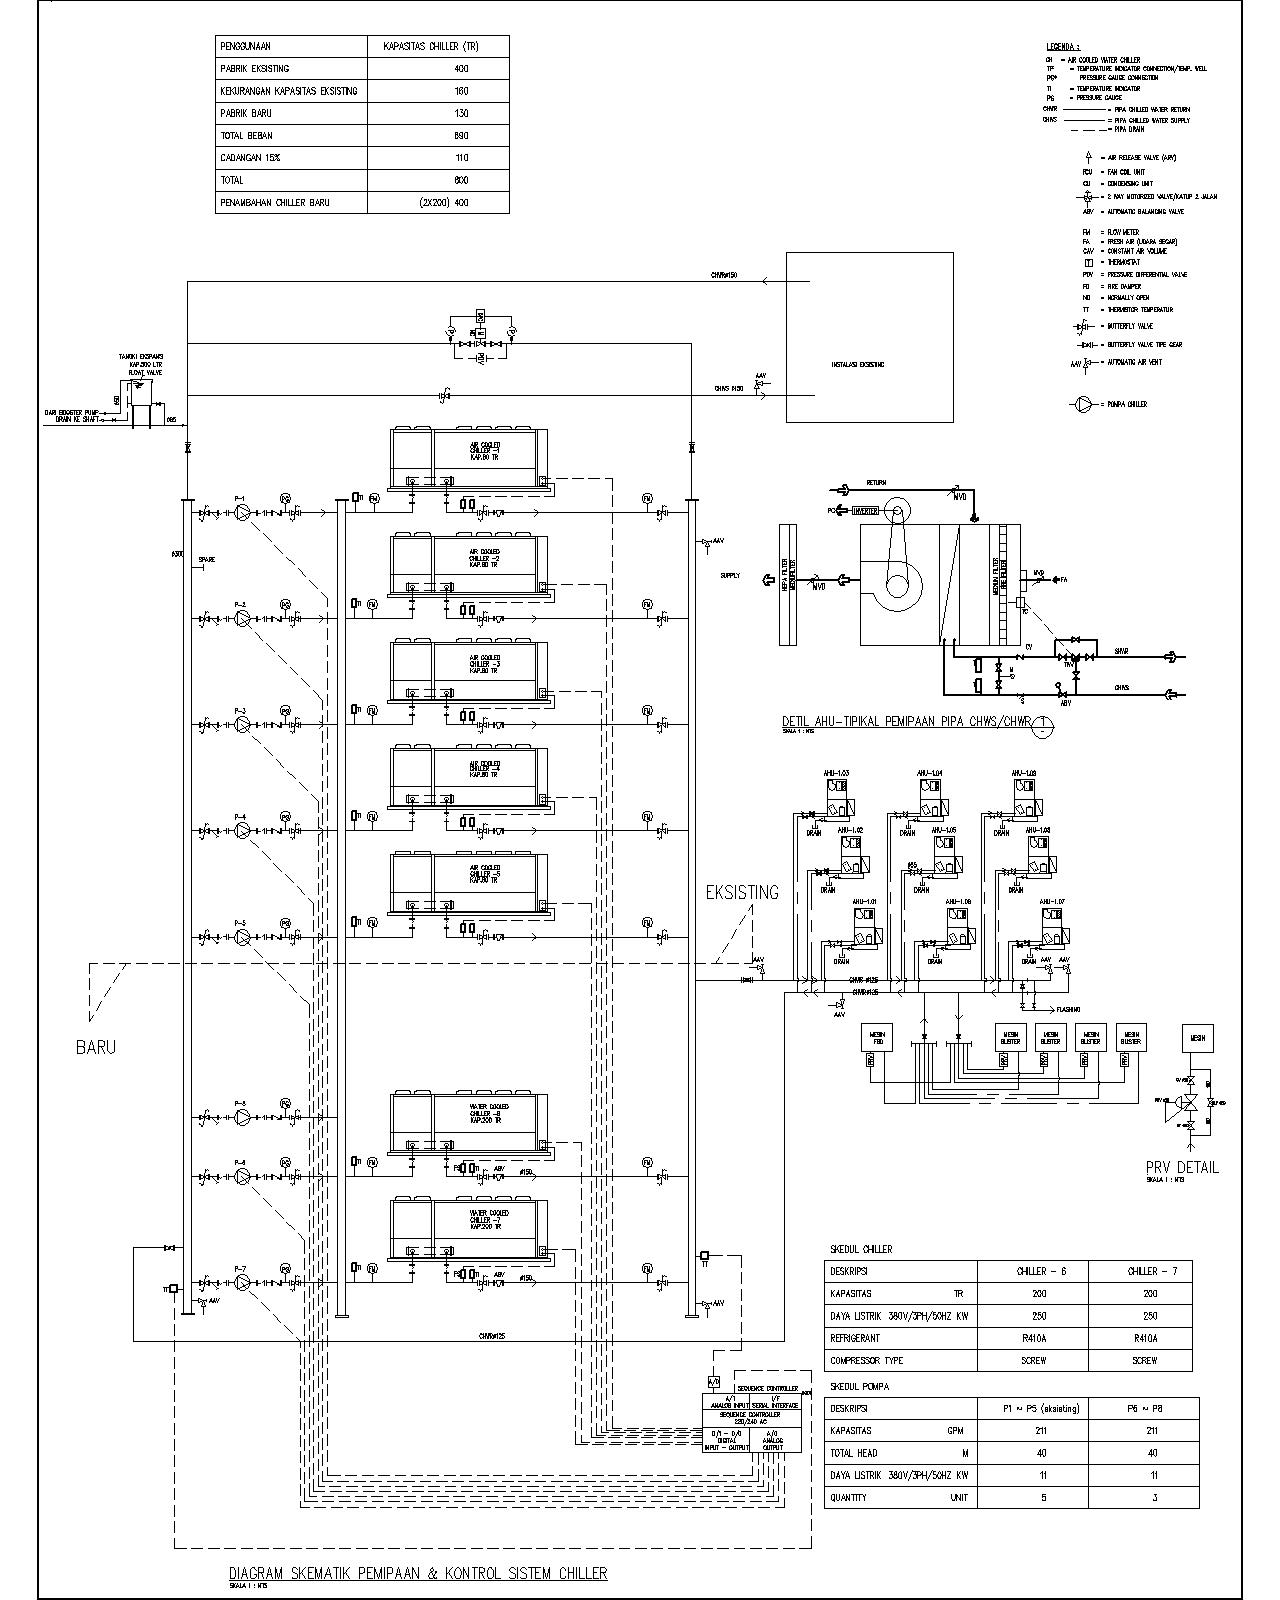 Building utilities water cooled chiller schematic diagram rh buildingutilities blogspot chilled water system schematic diagram